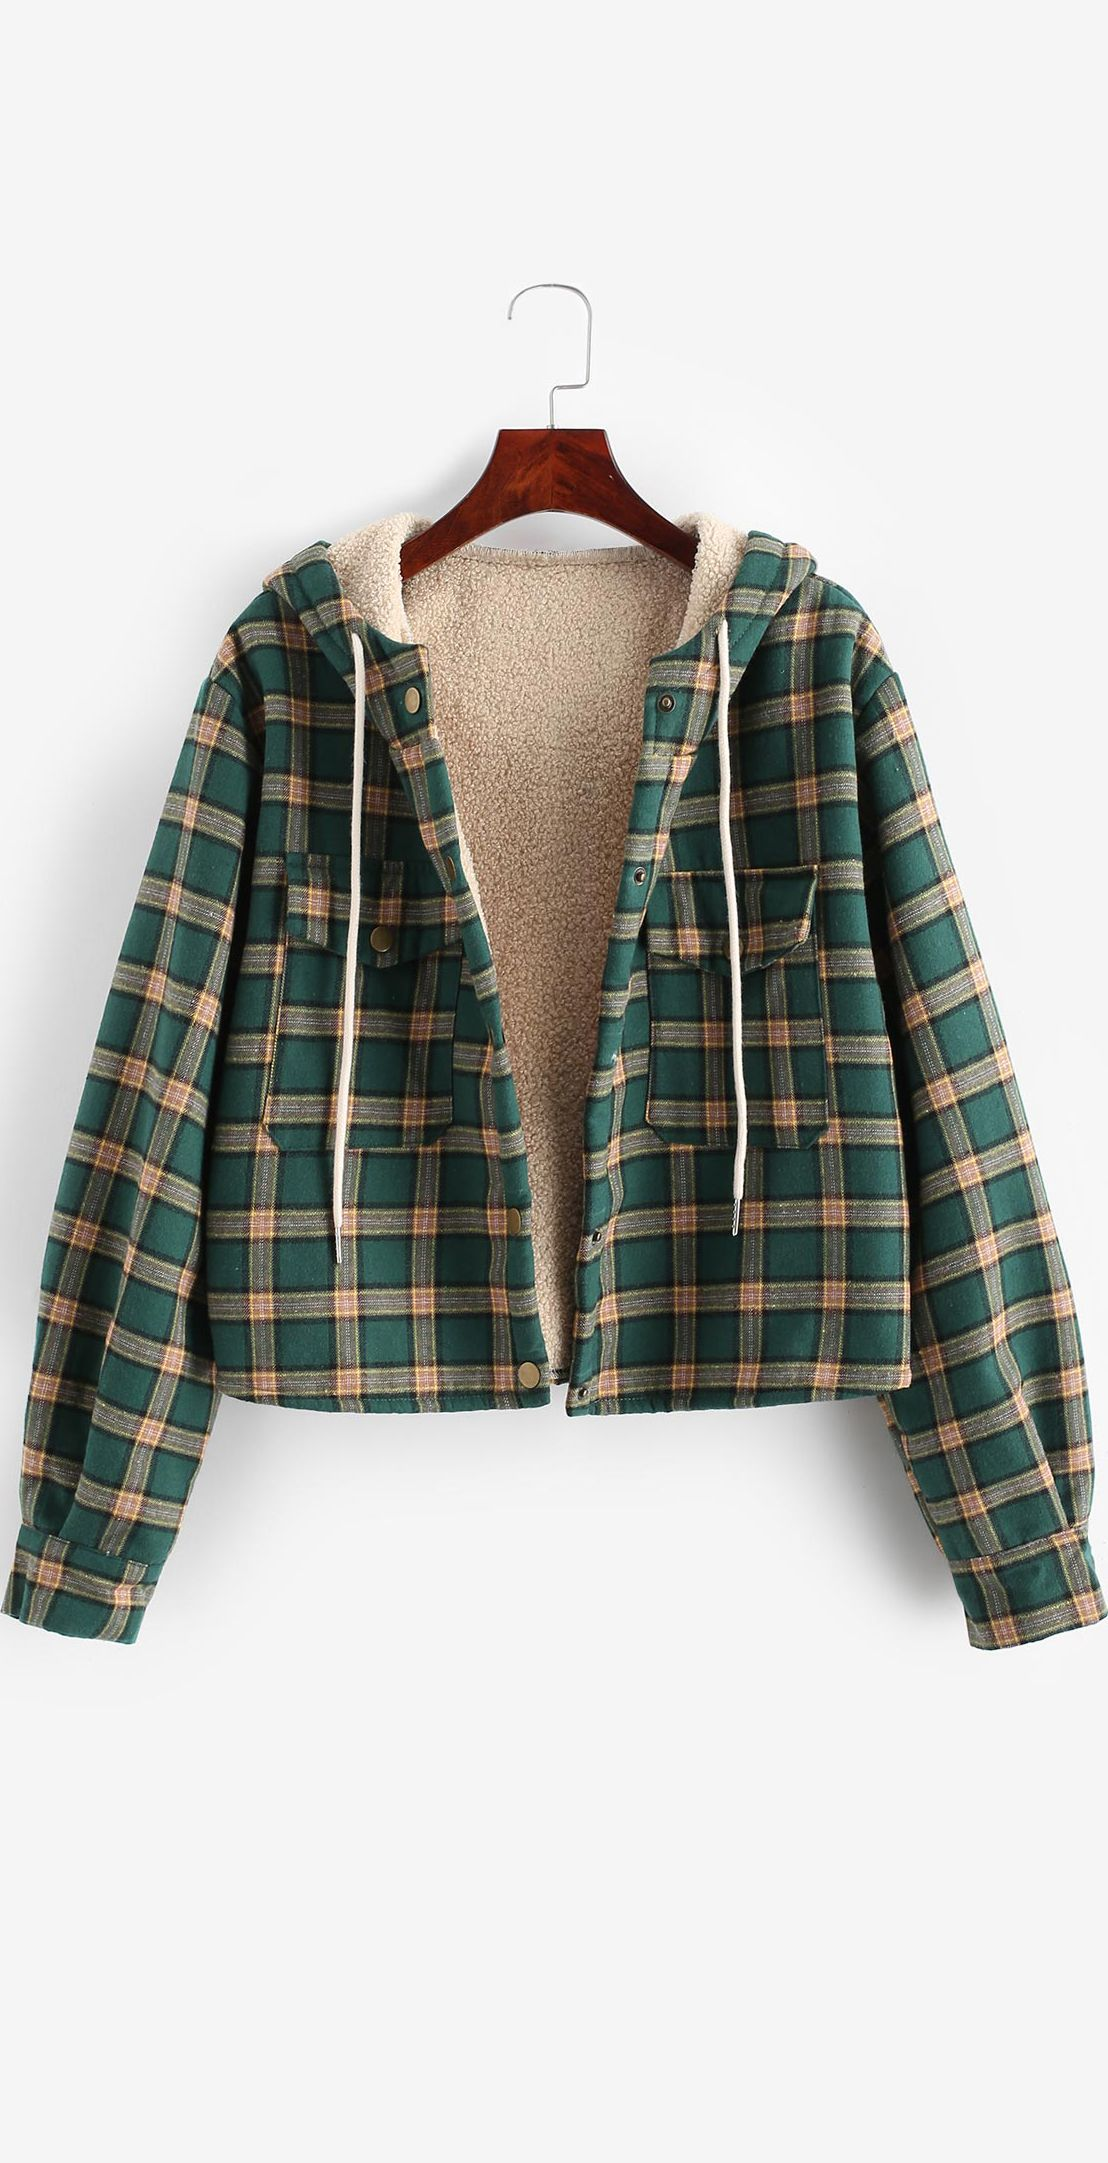 Flap Pockets Fleece Line Snap Button Plaid Jacket